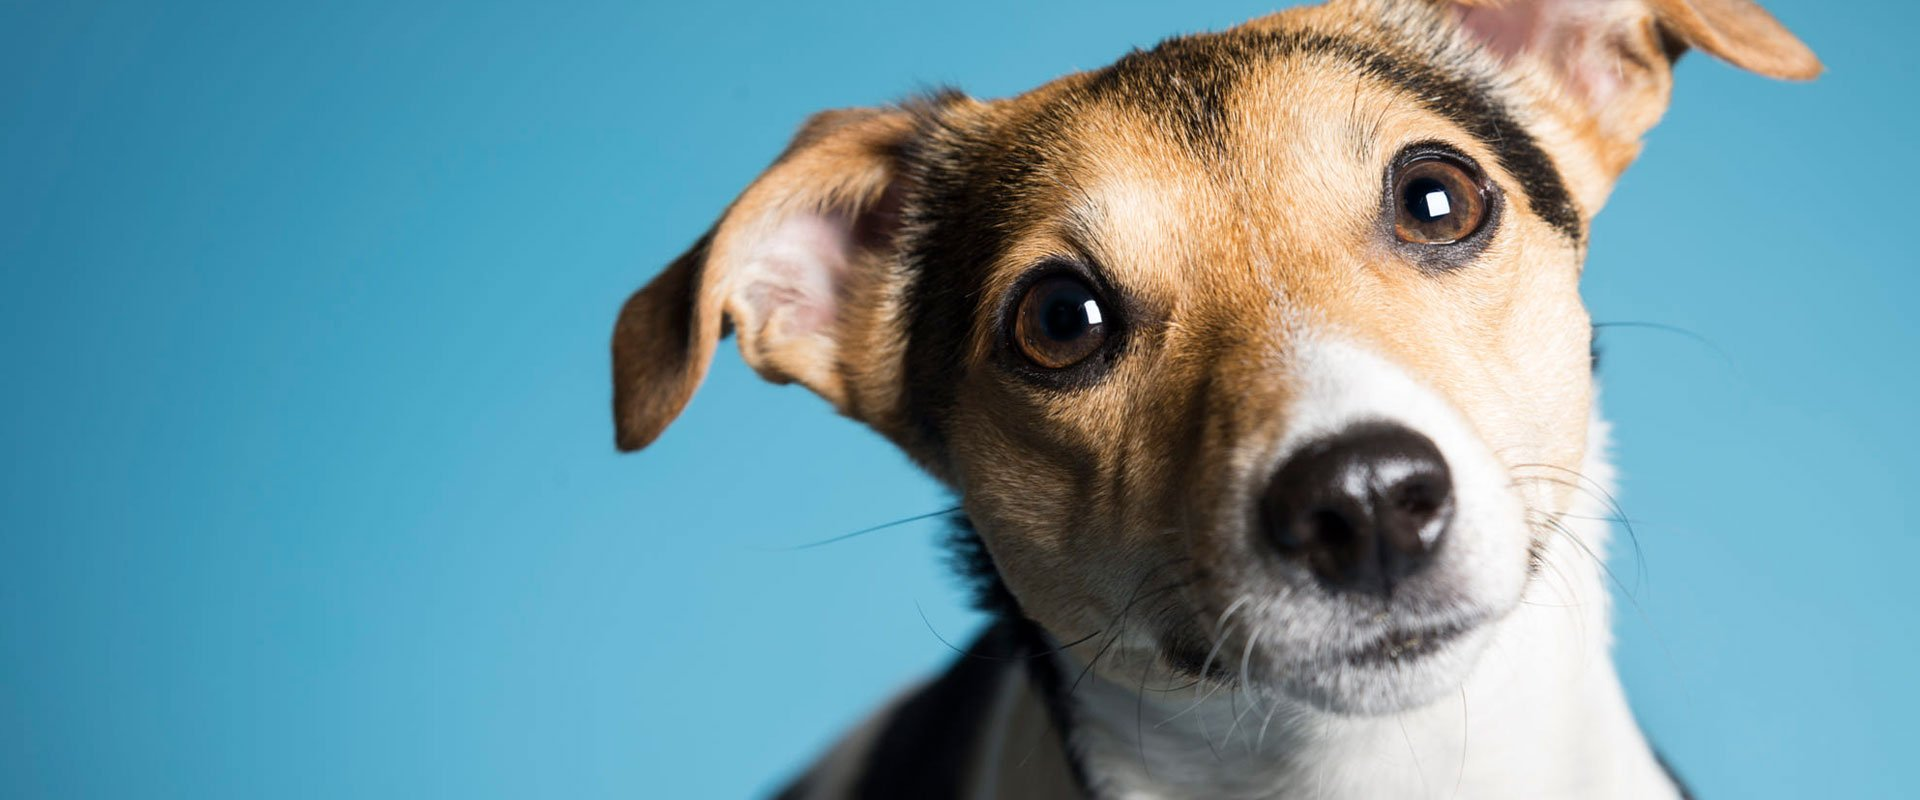 Victoria Dog Walking Service - Dedras Dogs